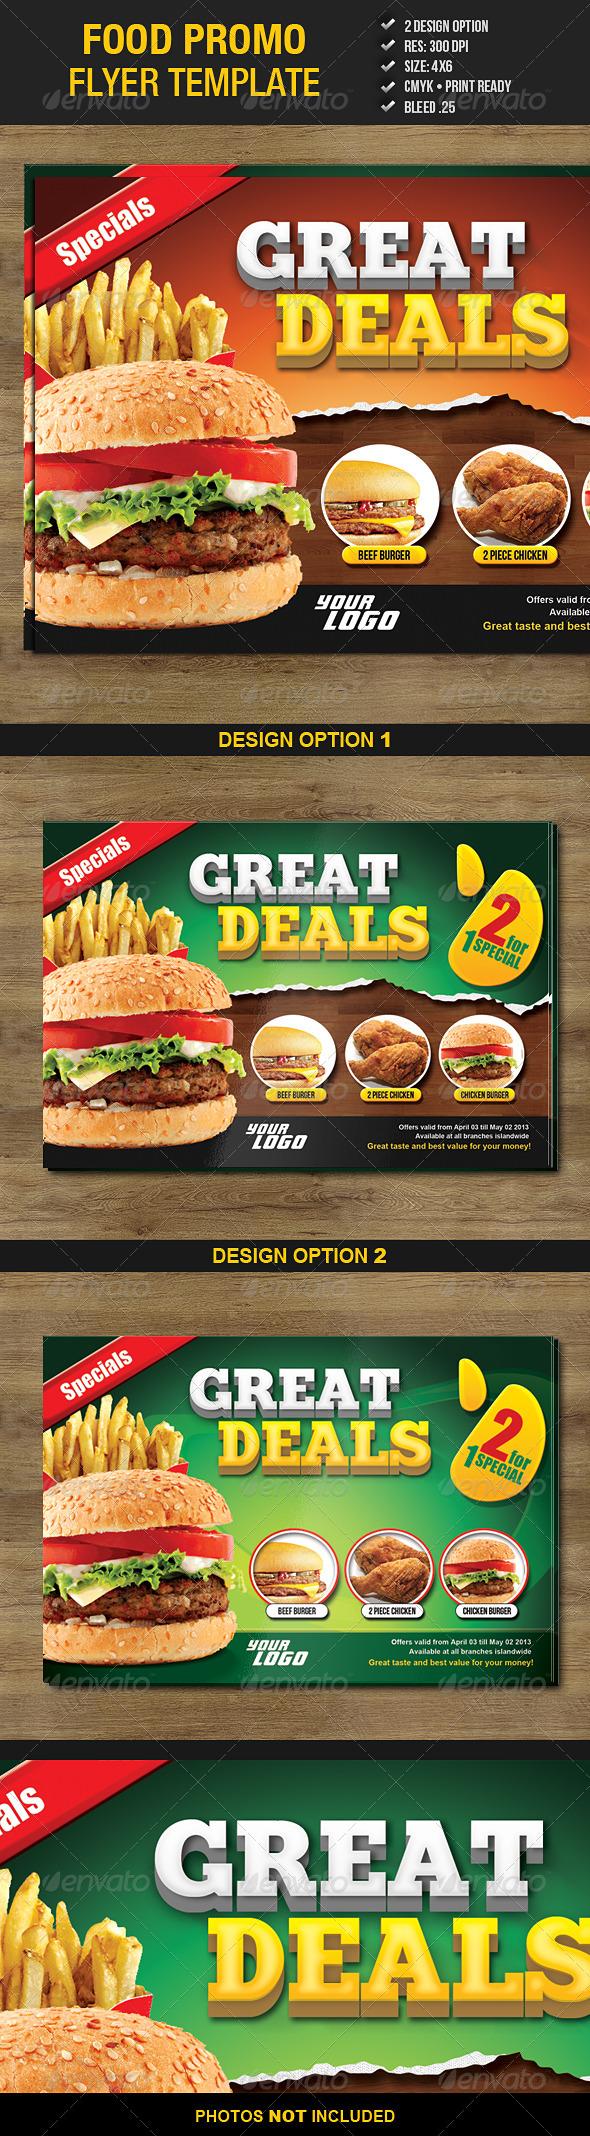 Food Promo Flyer Template - Restaurant Flyers